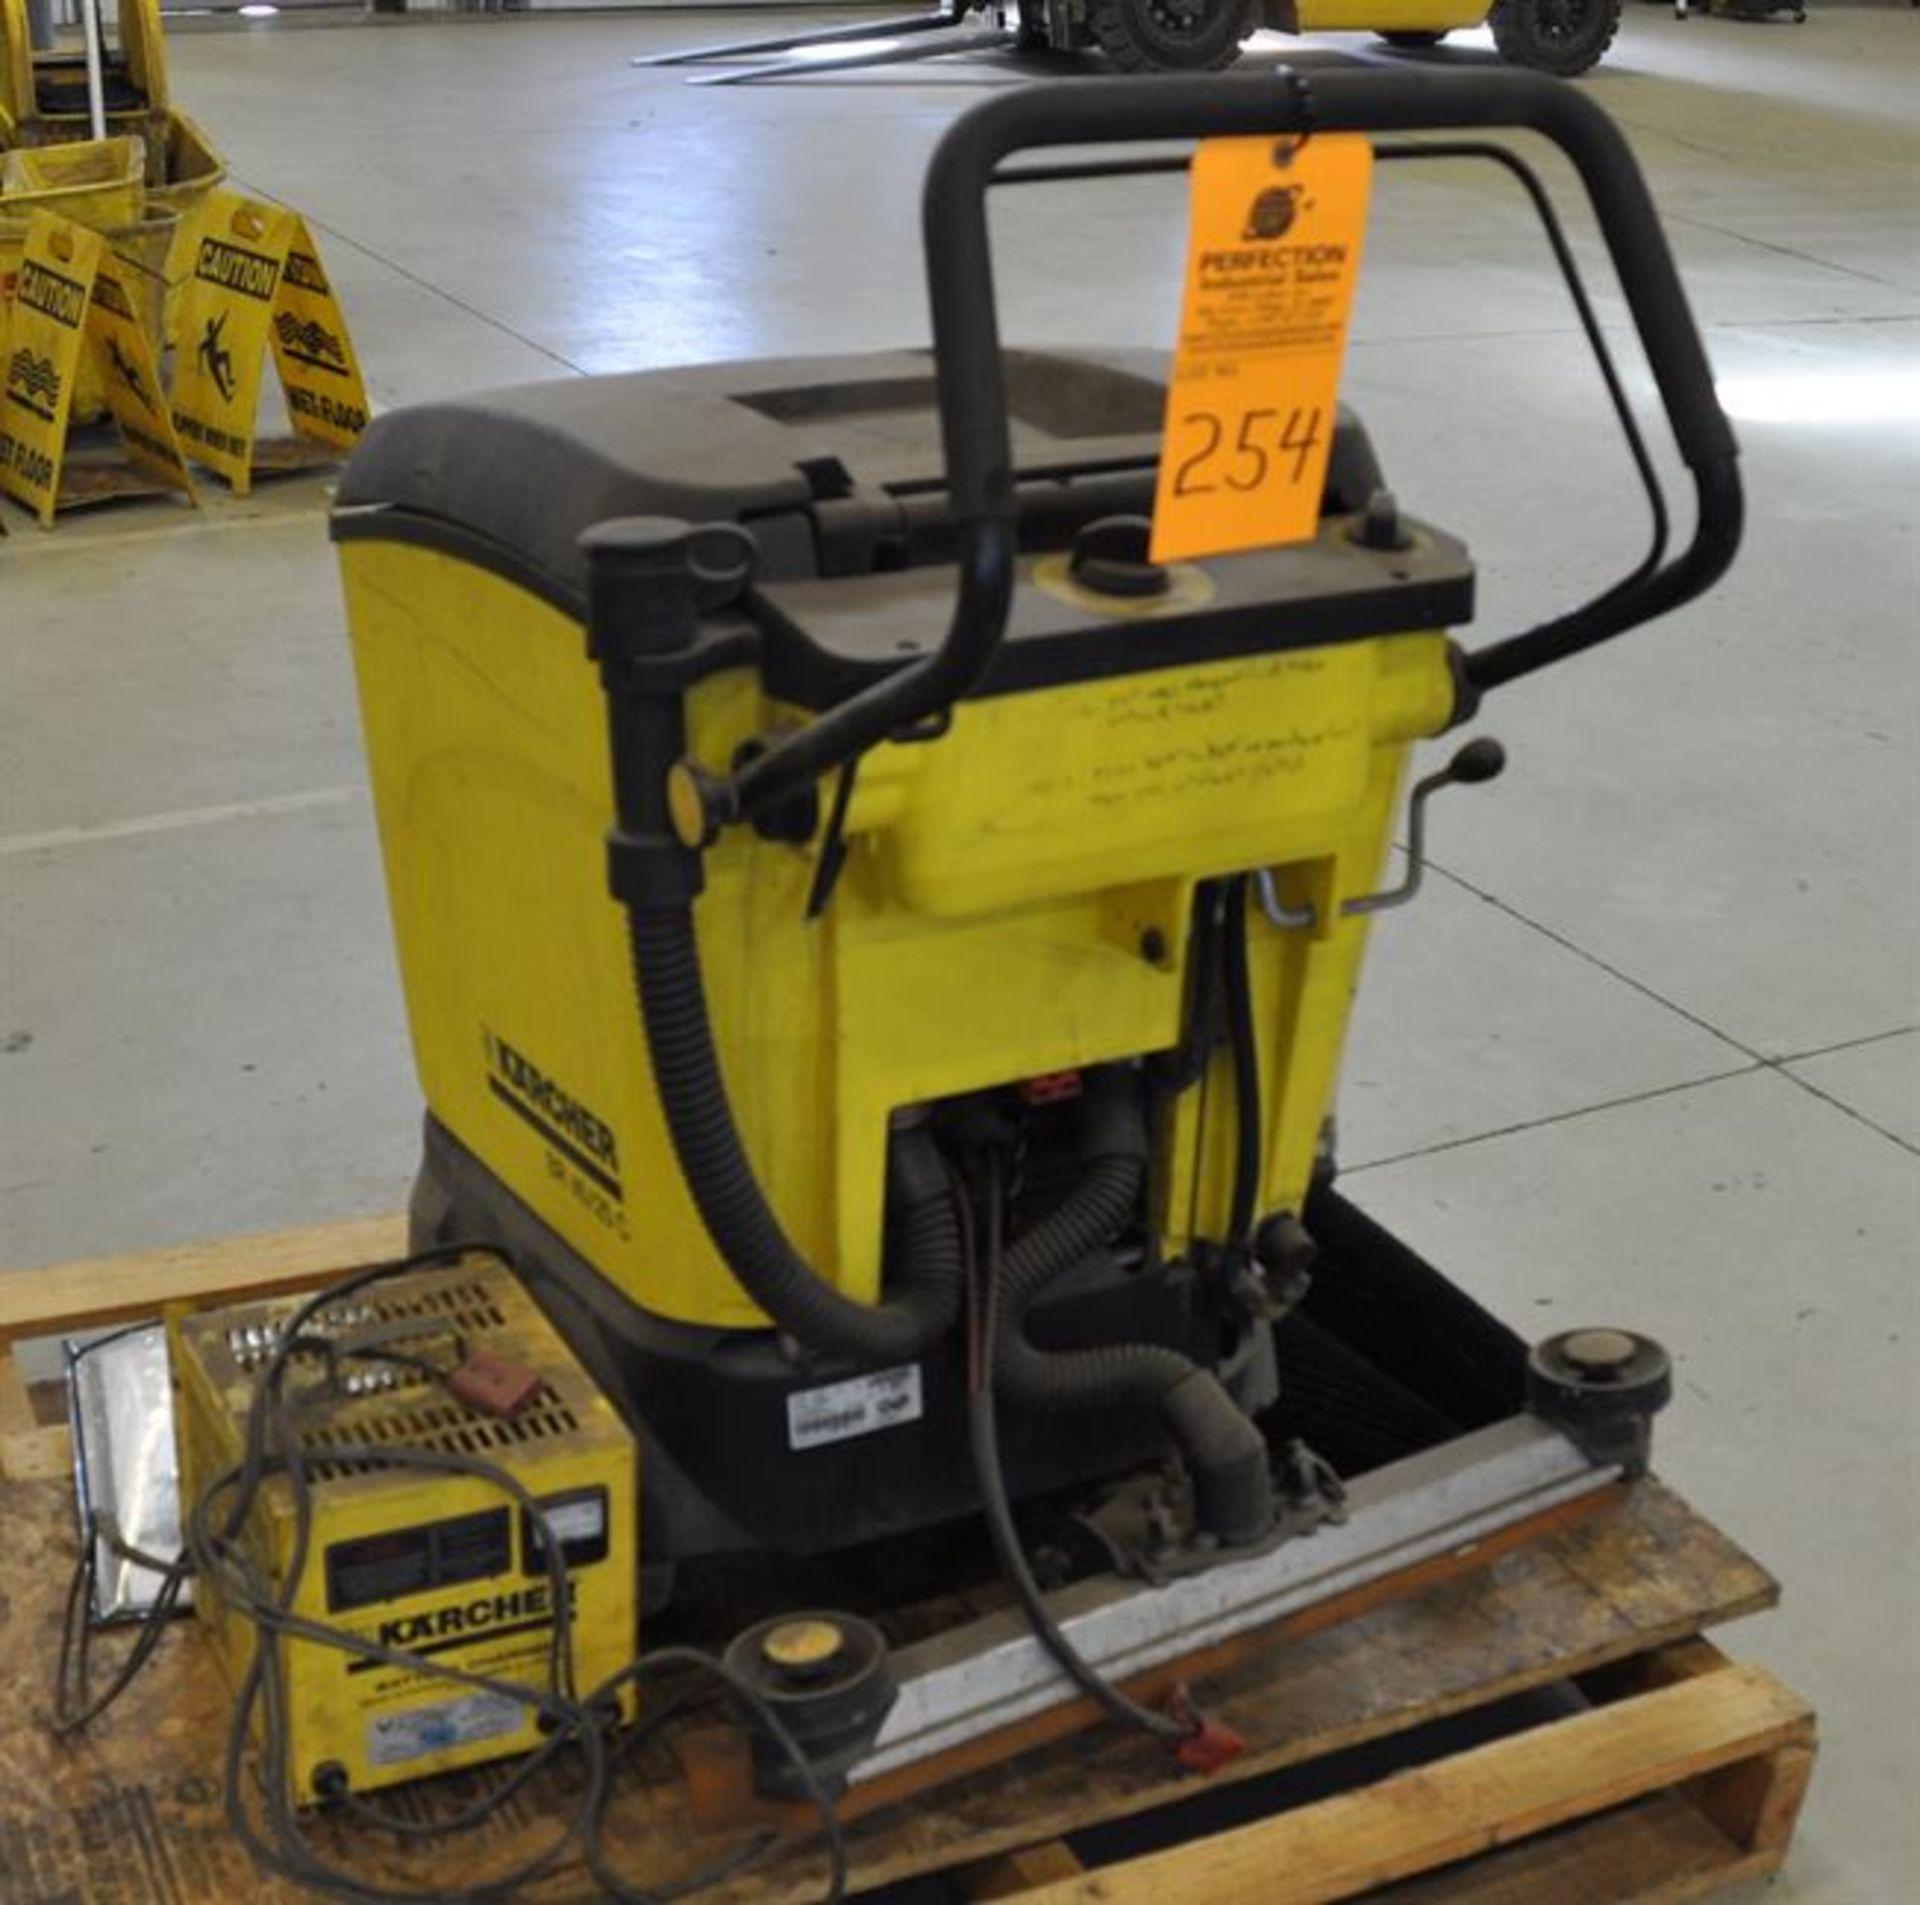 KARCHER BR 40/25 Electric Floor Scrubber - Image 2 of 2